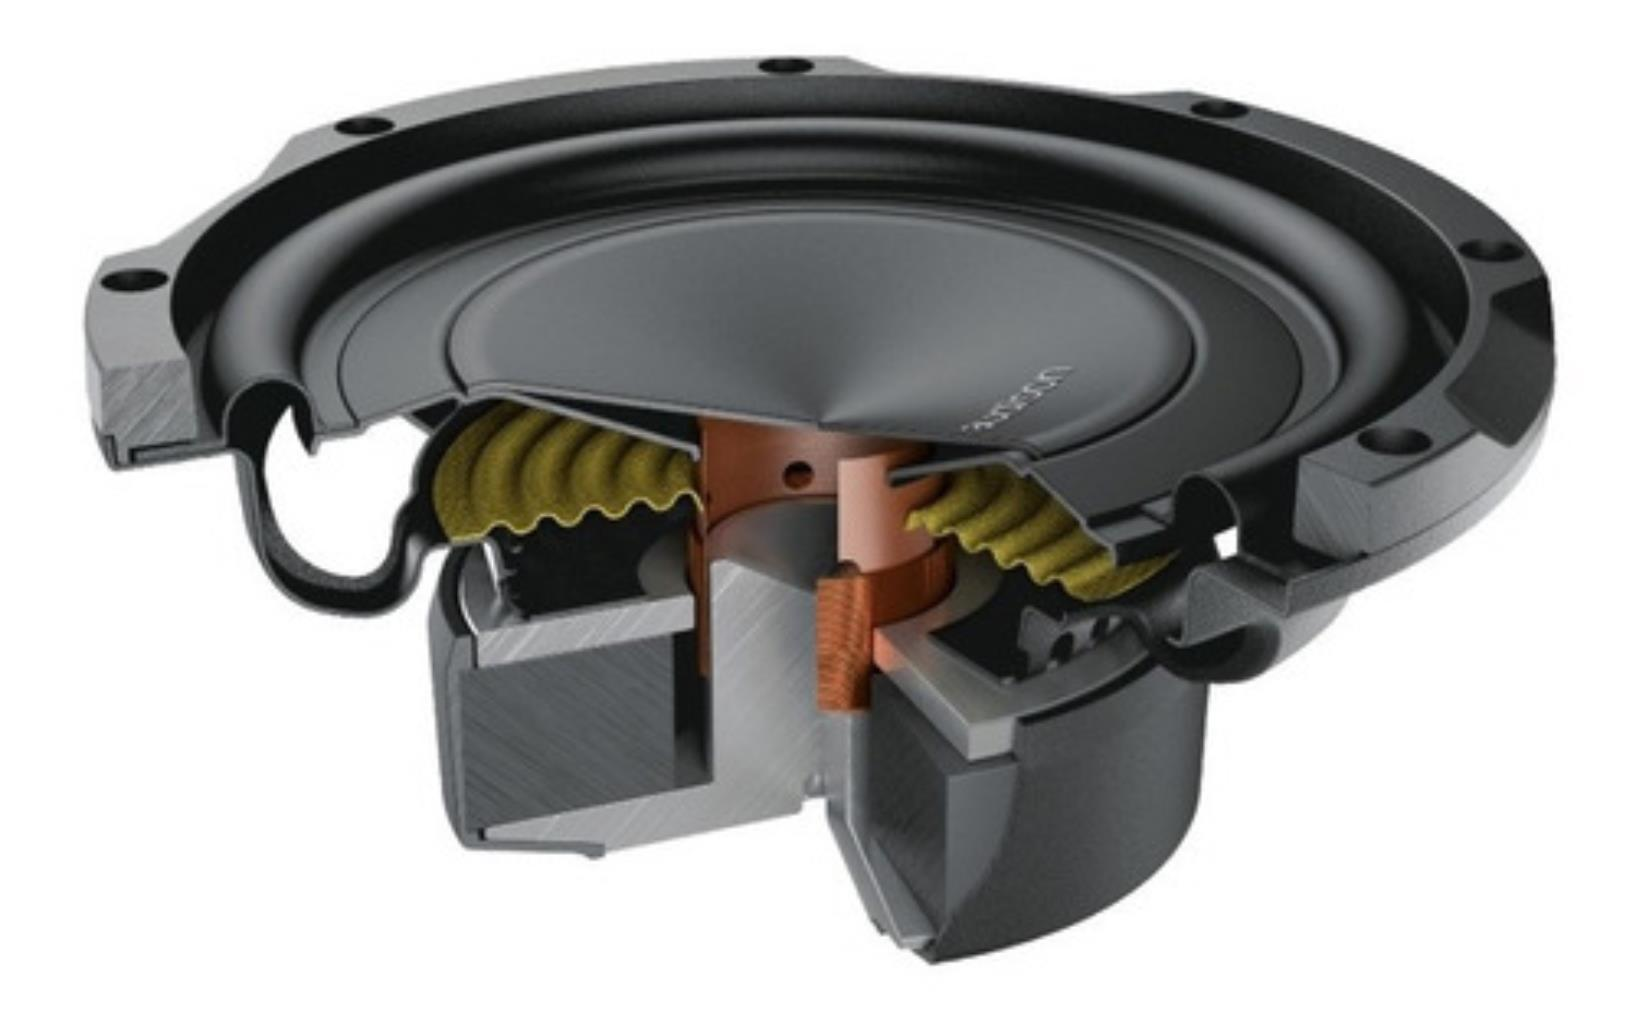 Audison Prima APS 8R subwoofer 8pol slim (0W RMS)